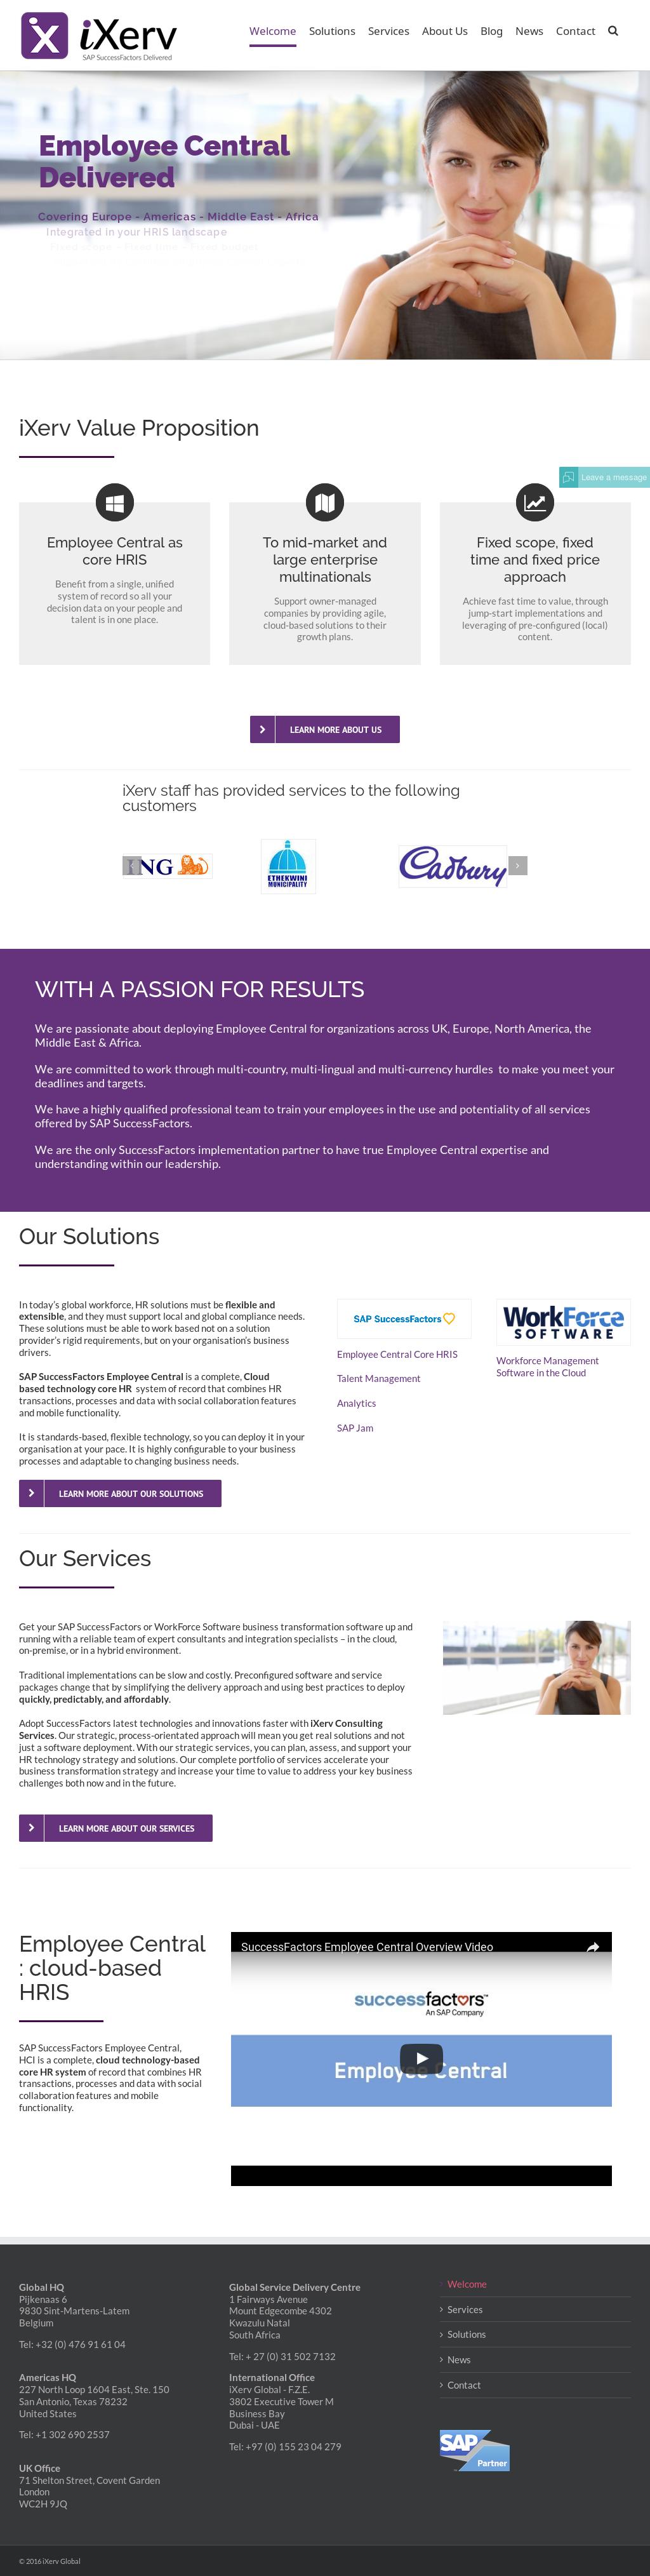 iXerv Competitors, Revenue and Employees - Owler Company Profile